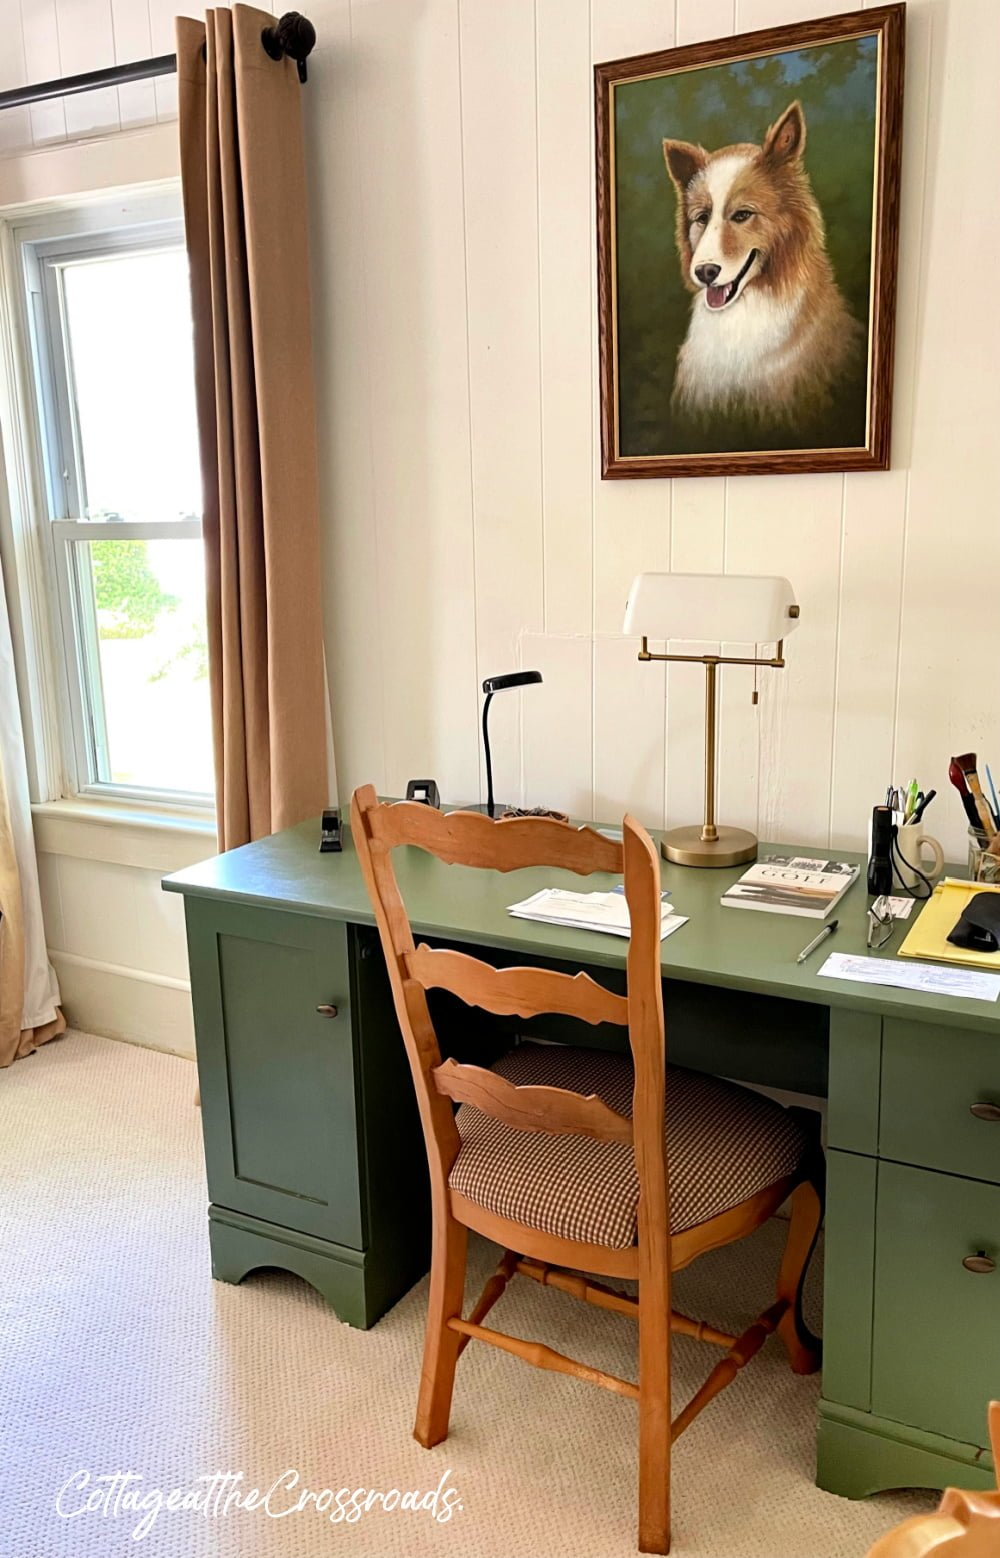 green desk and dog portrait above